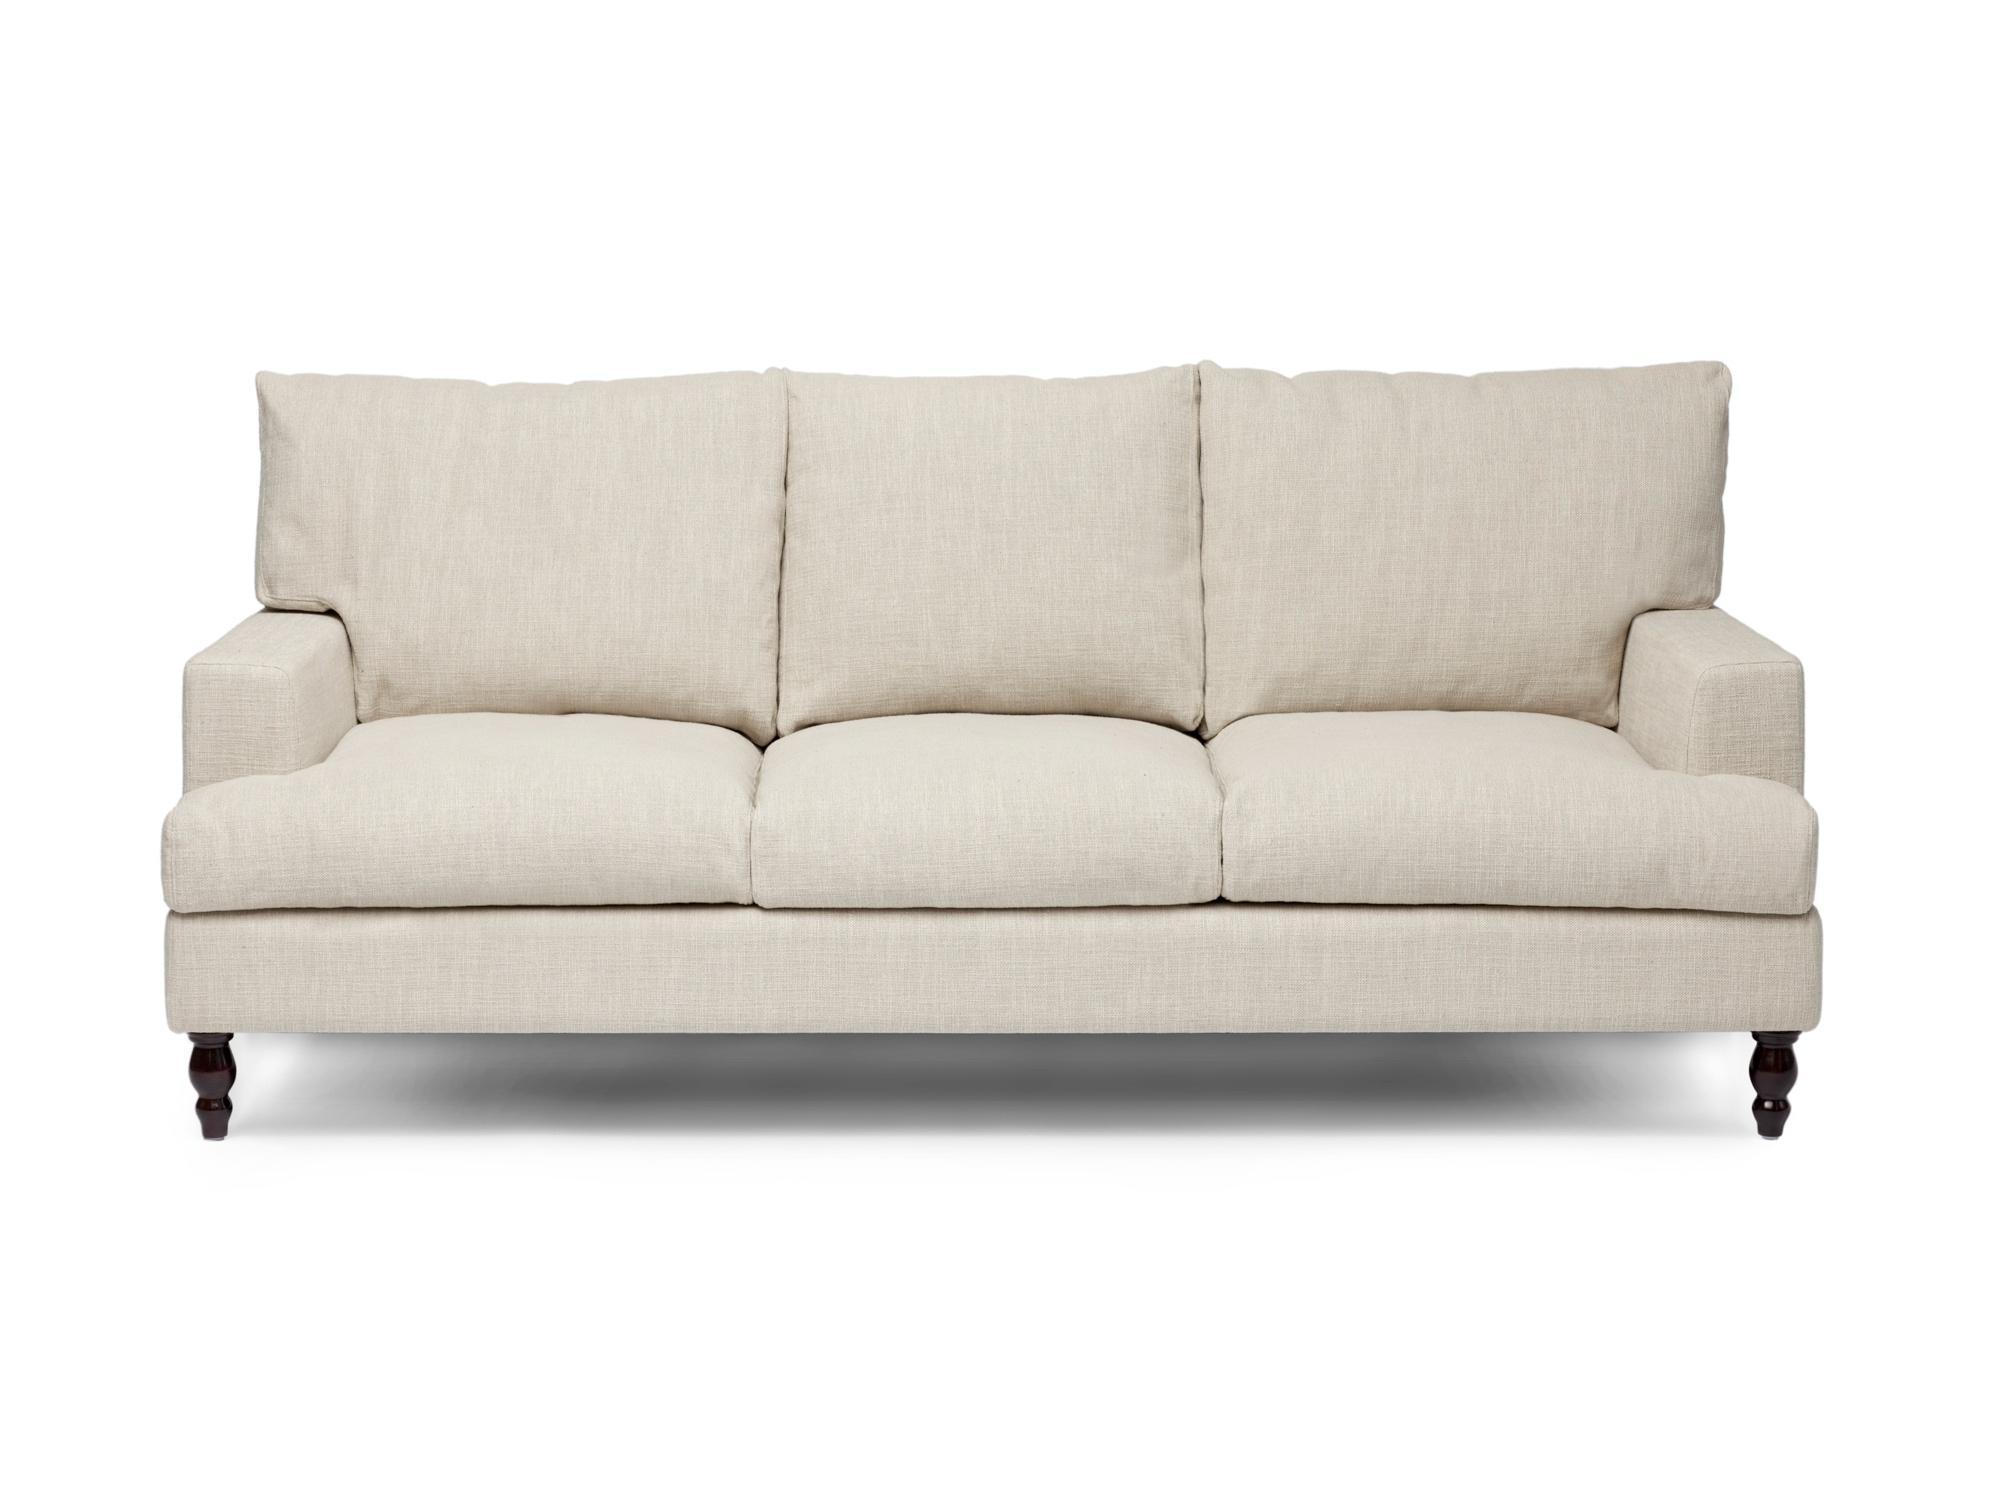 Savoy – 3 Seat Sofa | Loungelovers Inside Savoy Sofas (Image 7 of 20)